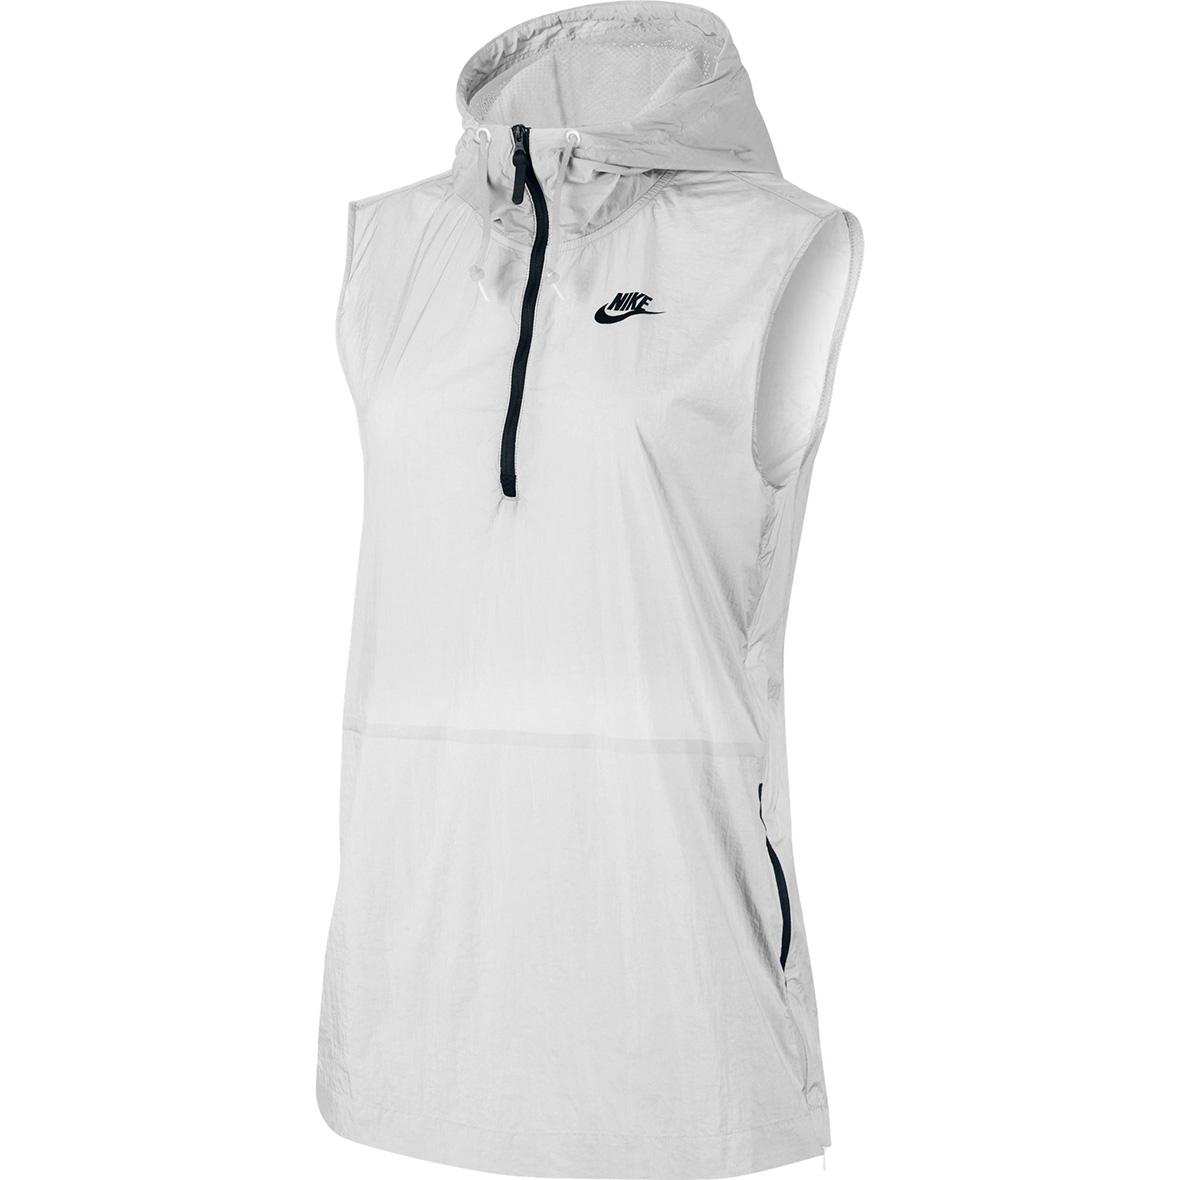 Nike Womens Tech Hypermesh Vest Jacket